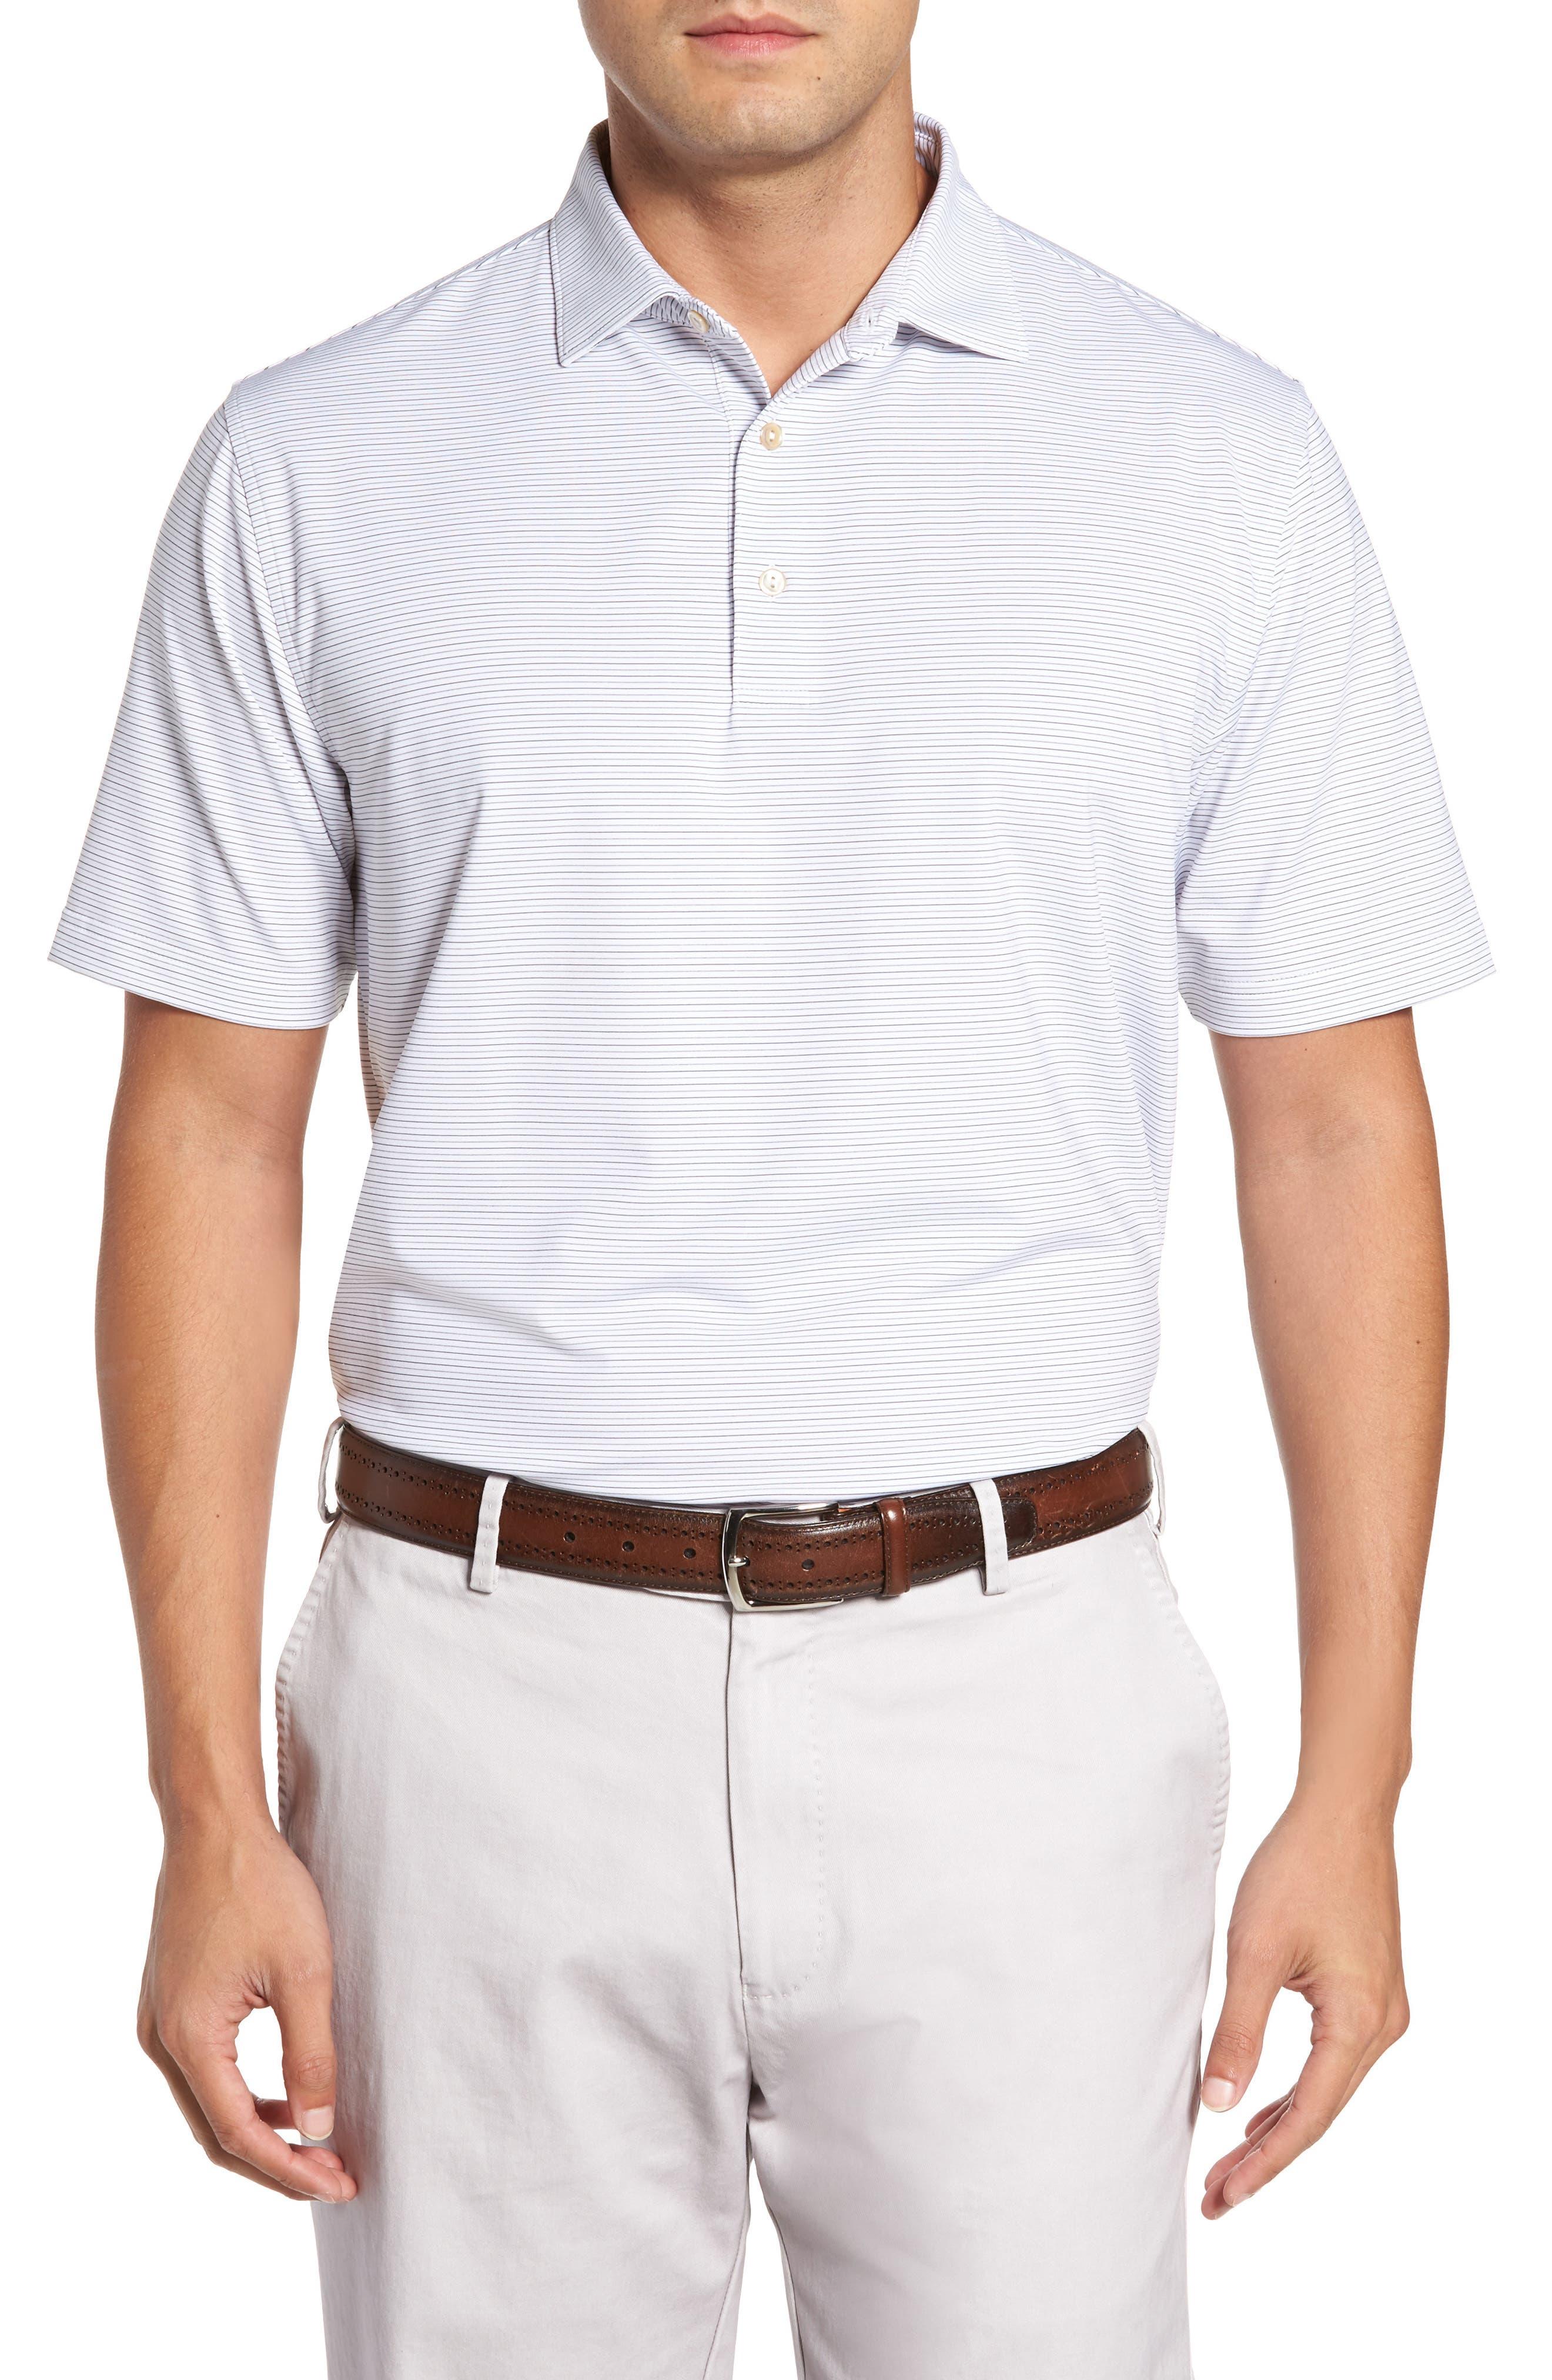 Alternate Image 1 Selected - Peter Millar Chesapeake Stripe Stretch Jersey Polo